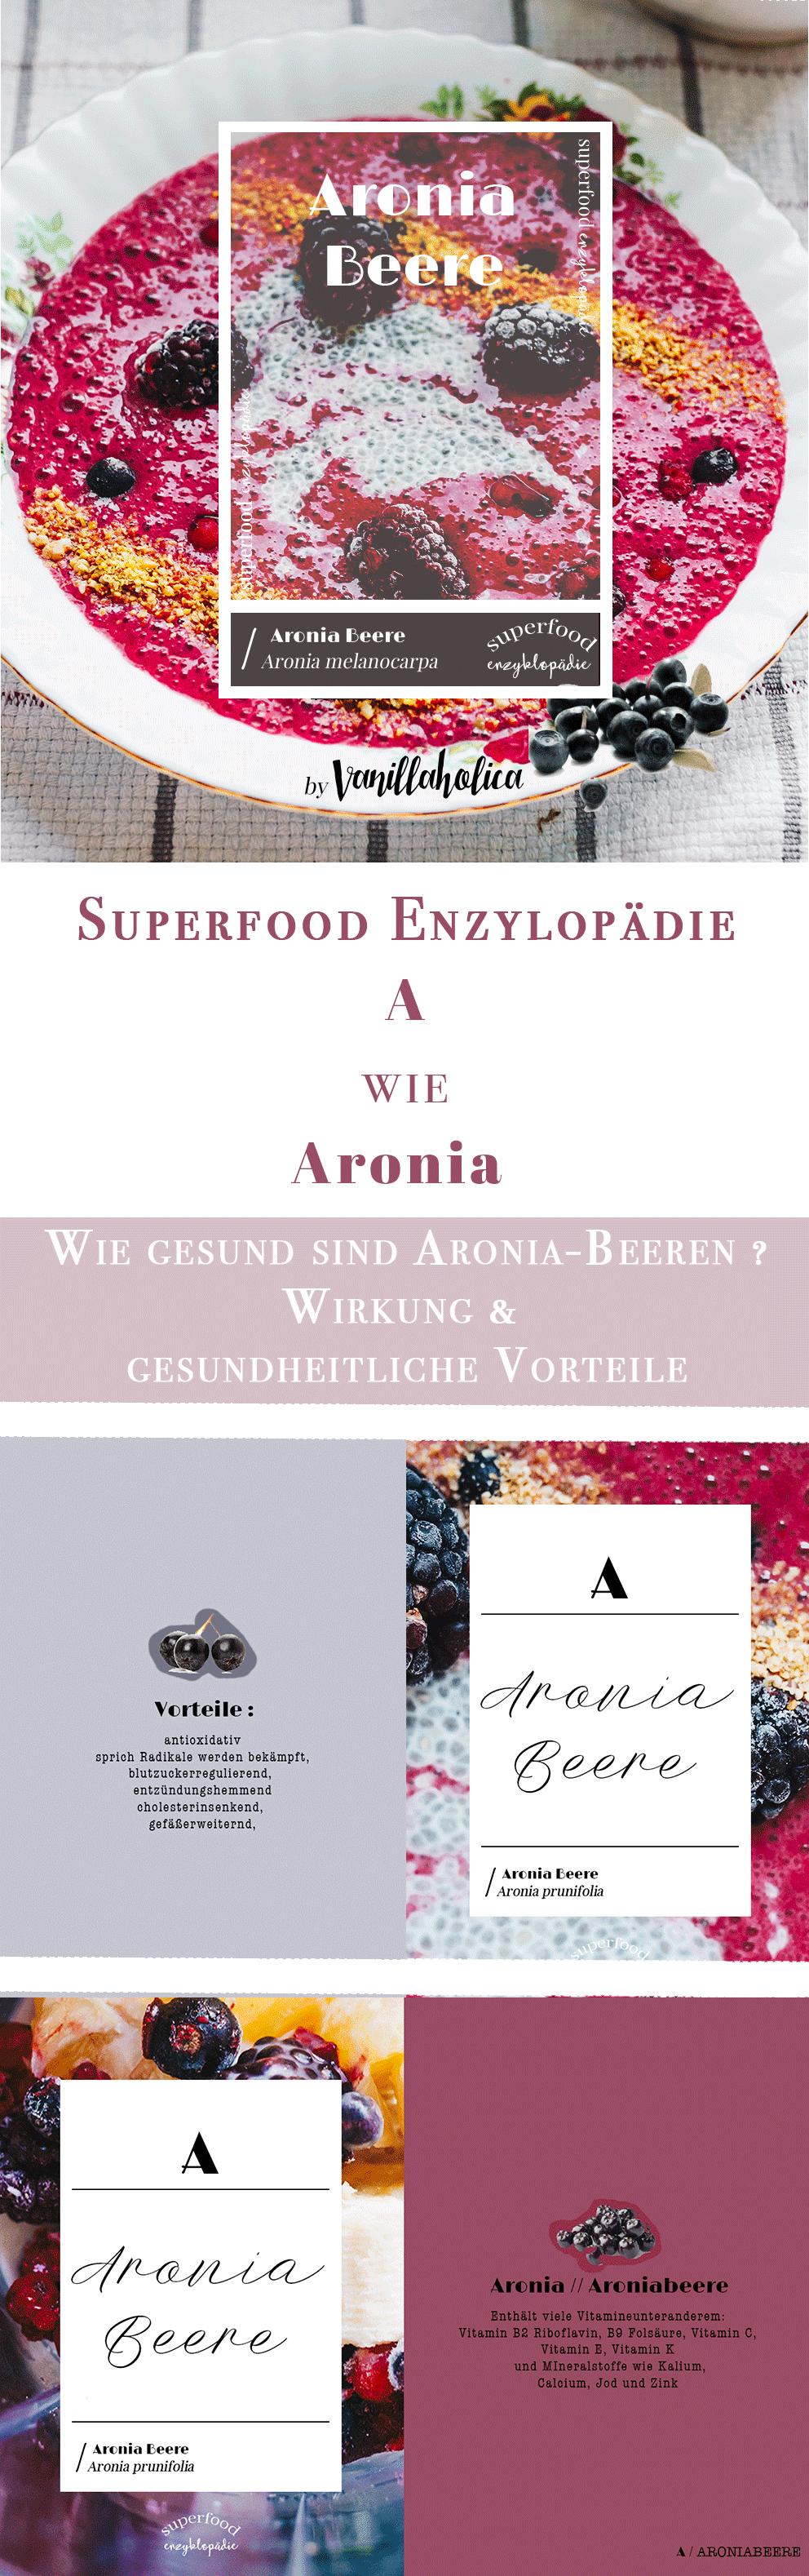 Superfood Enzyklopadie A Wie Aroniabeere Apfelbeere